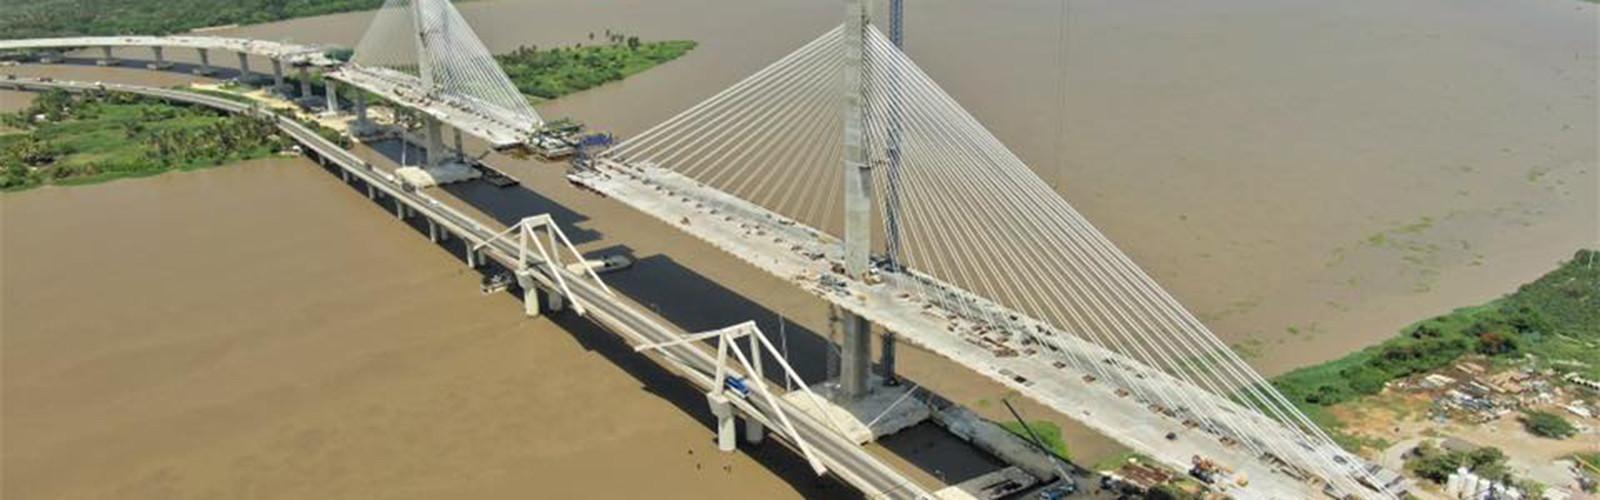 Sacyr, segundo mayor desarrollador de infraestructuras en Iberoamérica